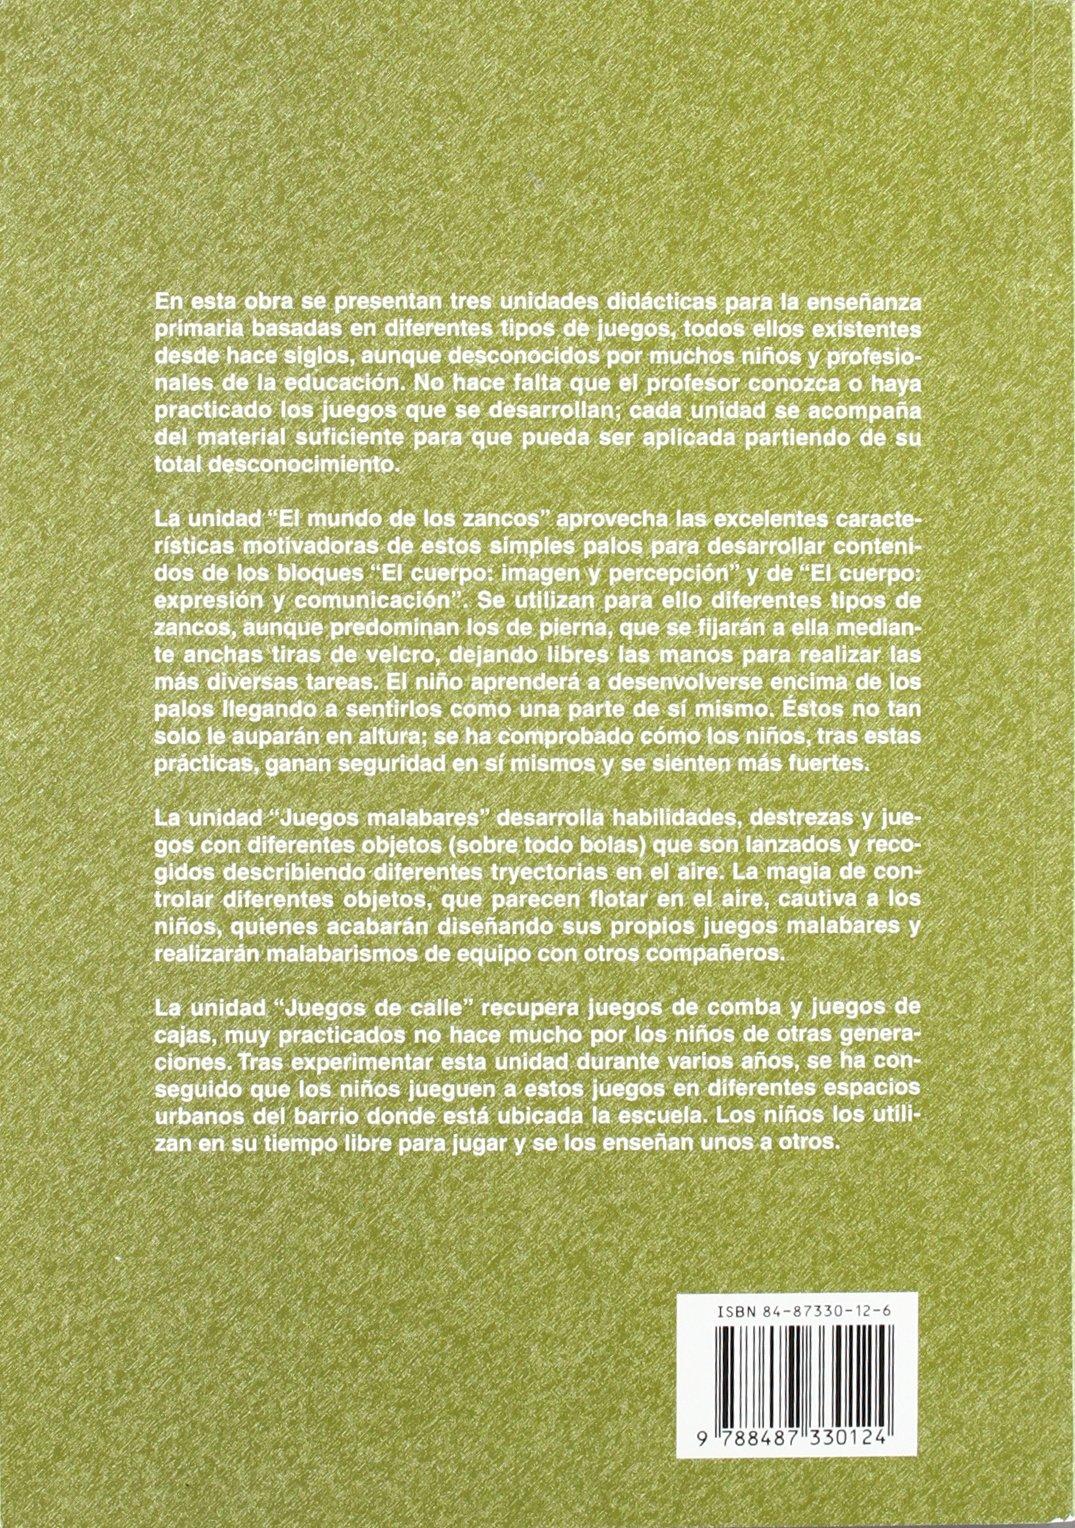 Unidades Didacticas Para Primaria II (Spanish Edition): Xavier Aguado Joder, Ana Fernandez Ordonez: 9788487330124: Amazon.com: Books